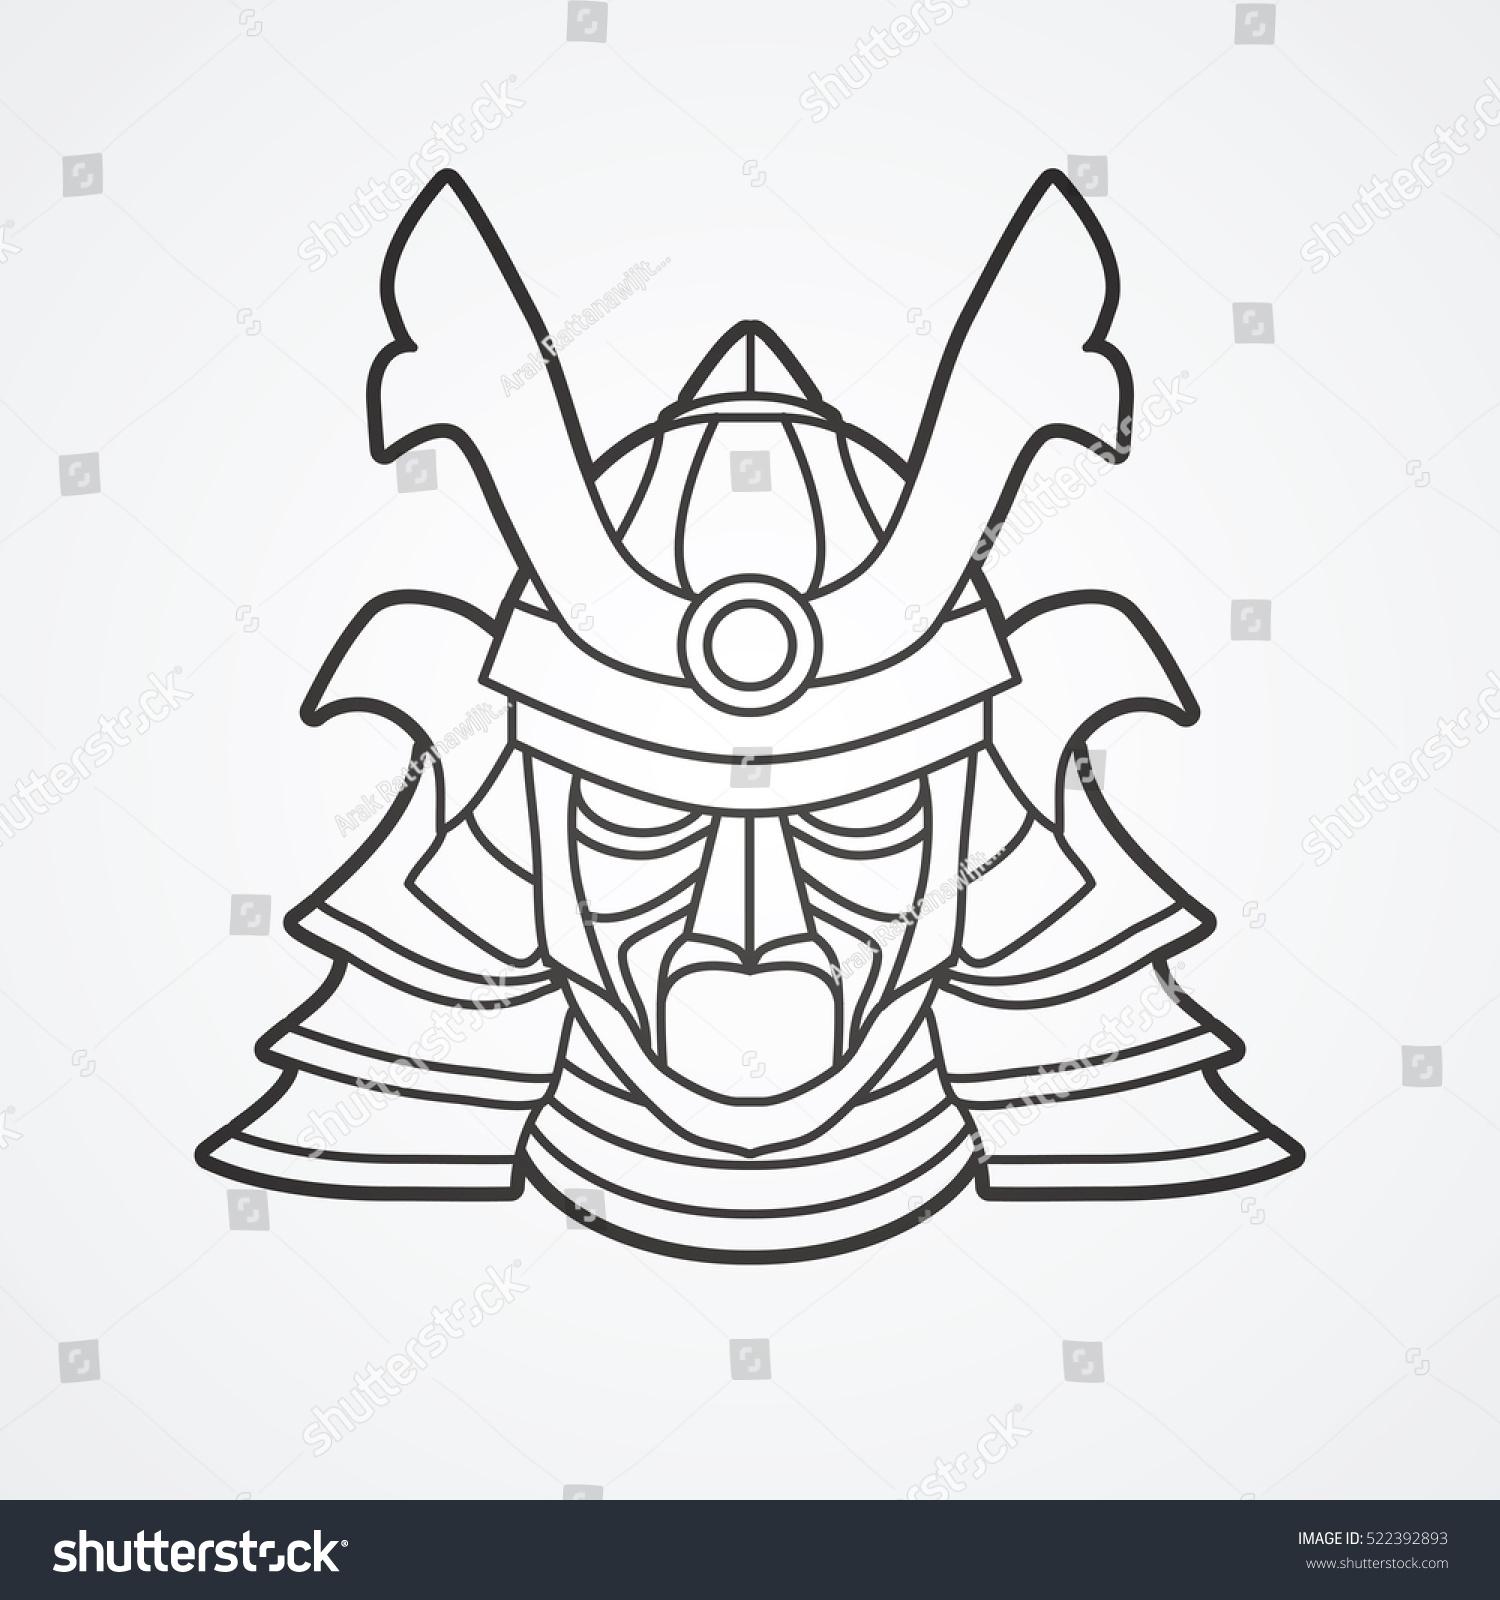 Samurai Mask Outline Graphic Vector Stock Vector 522392893 ...